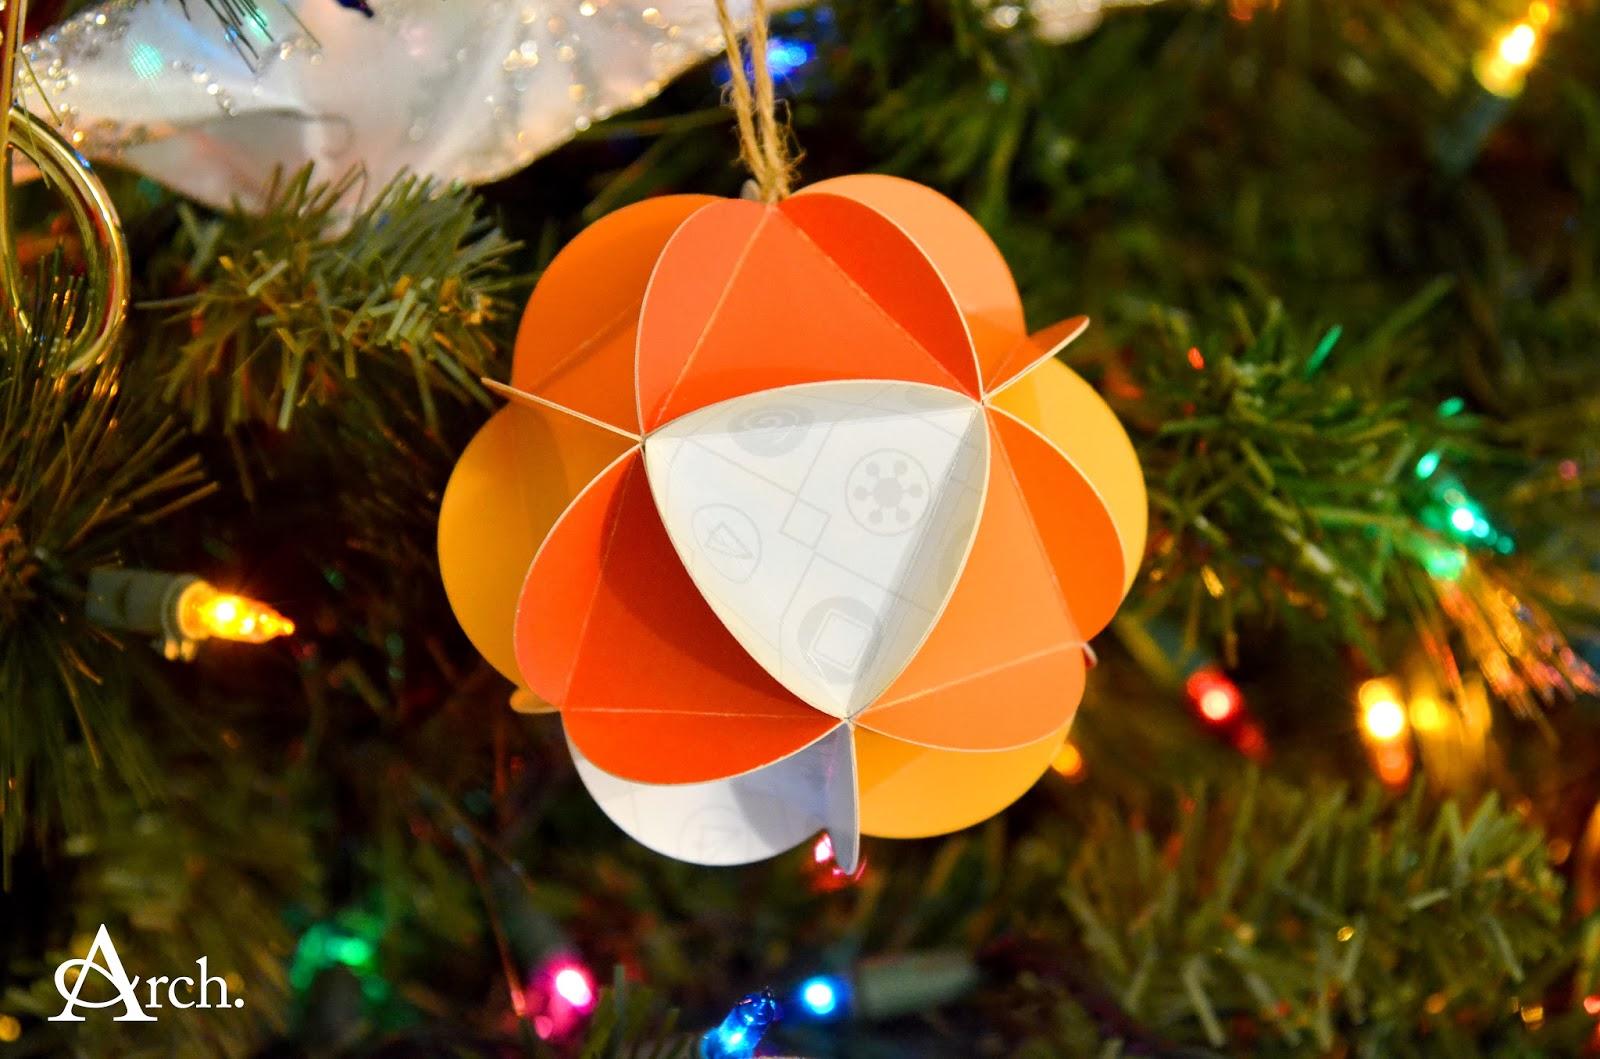 Andrea Arch 12 Days of DIY Ornaments Christmas Card